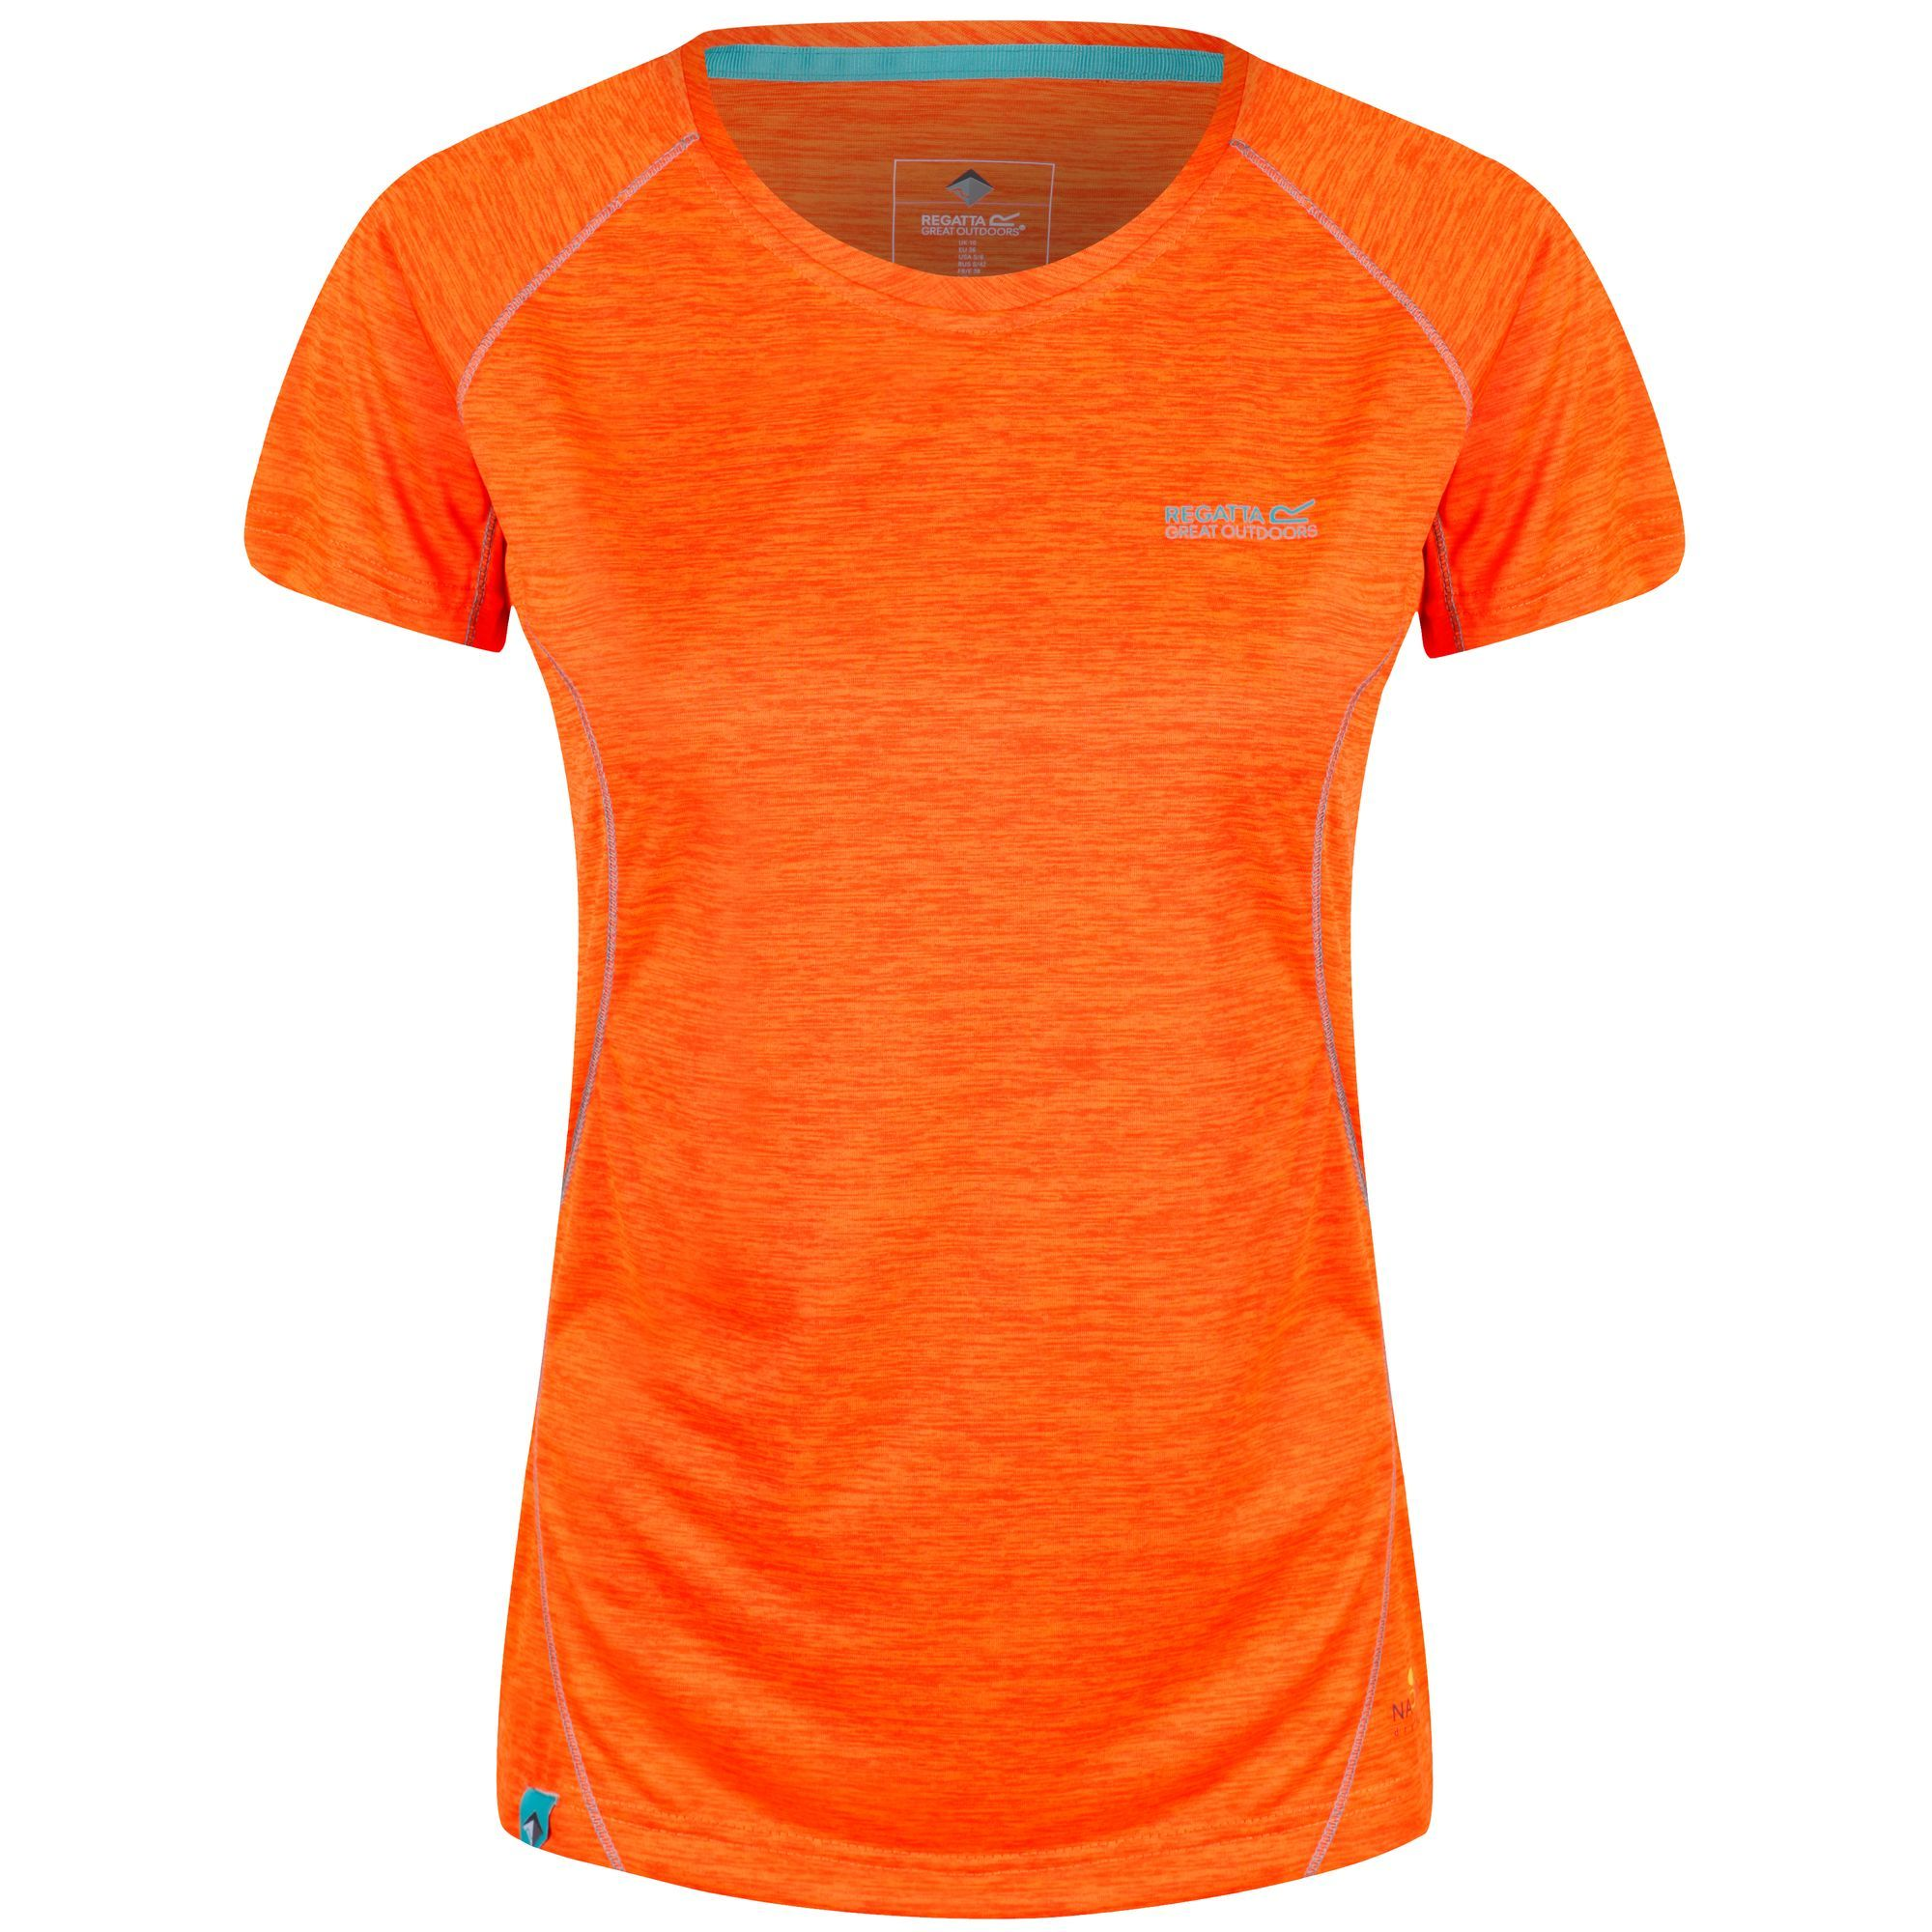 Regatta Womens Deserta Moisture Wicking T-Shirt